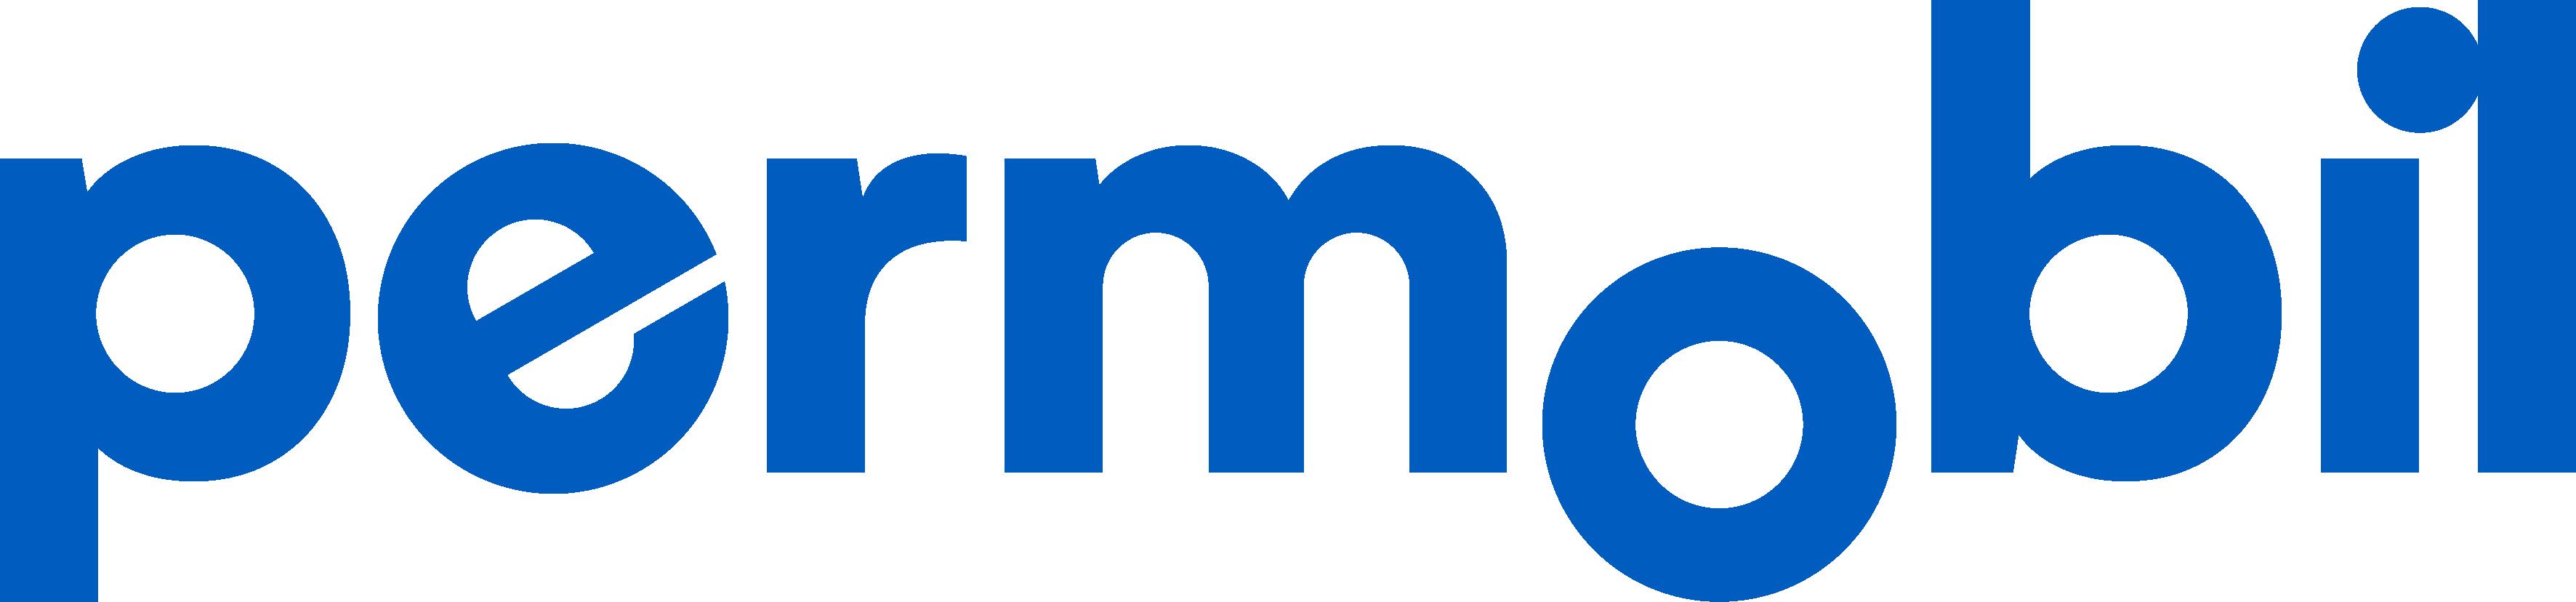 Permobil_logotype_RGB_blue